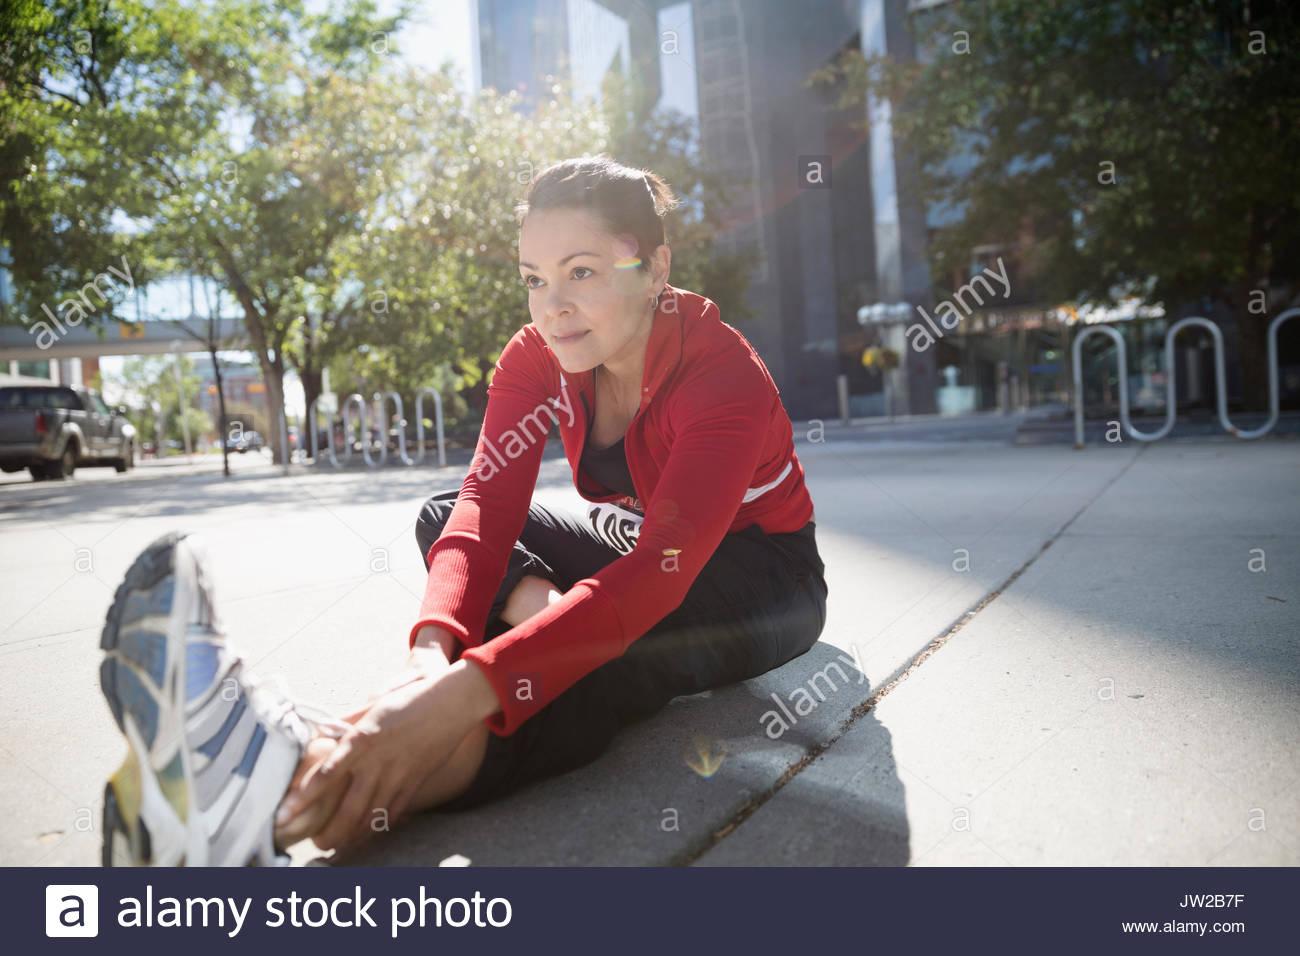 Woman stretching leg on sunny urban sidewalk - Stock Image